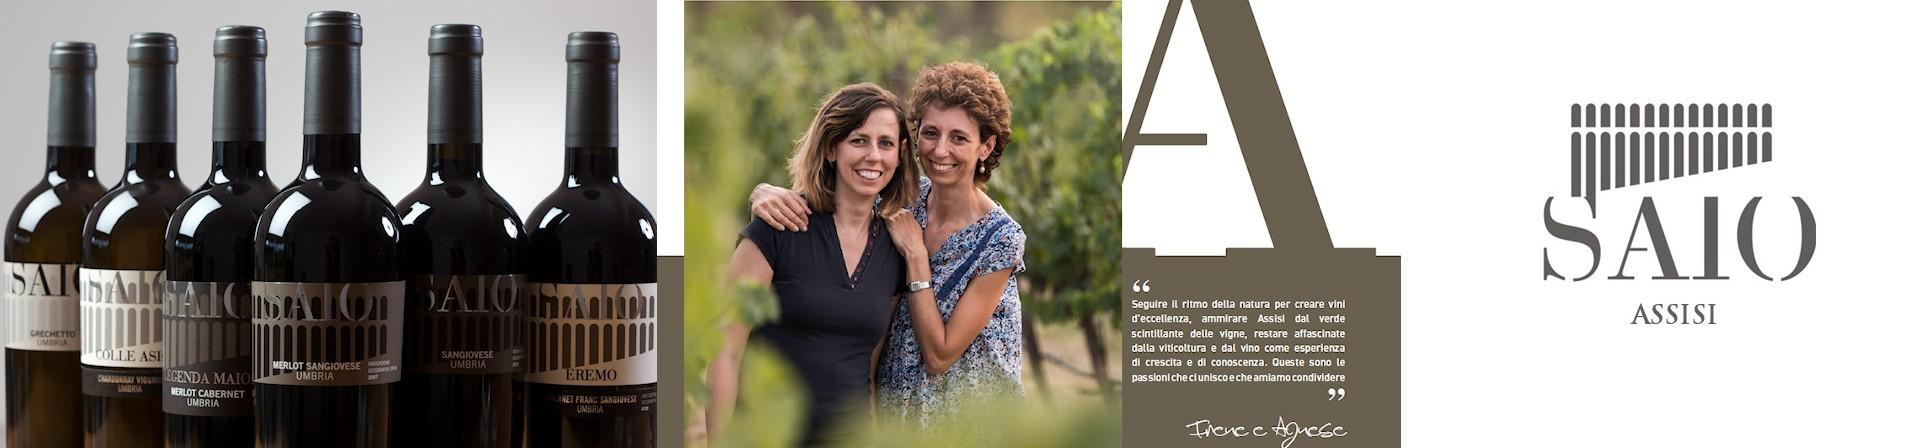 Vini SAIO Assisi - vendita online